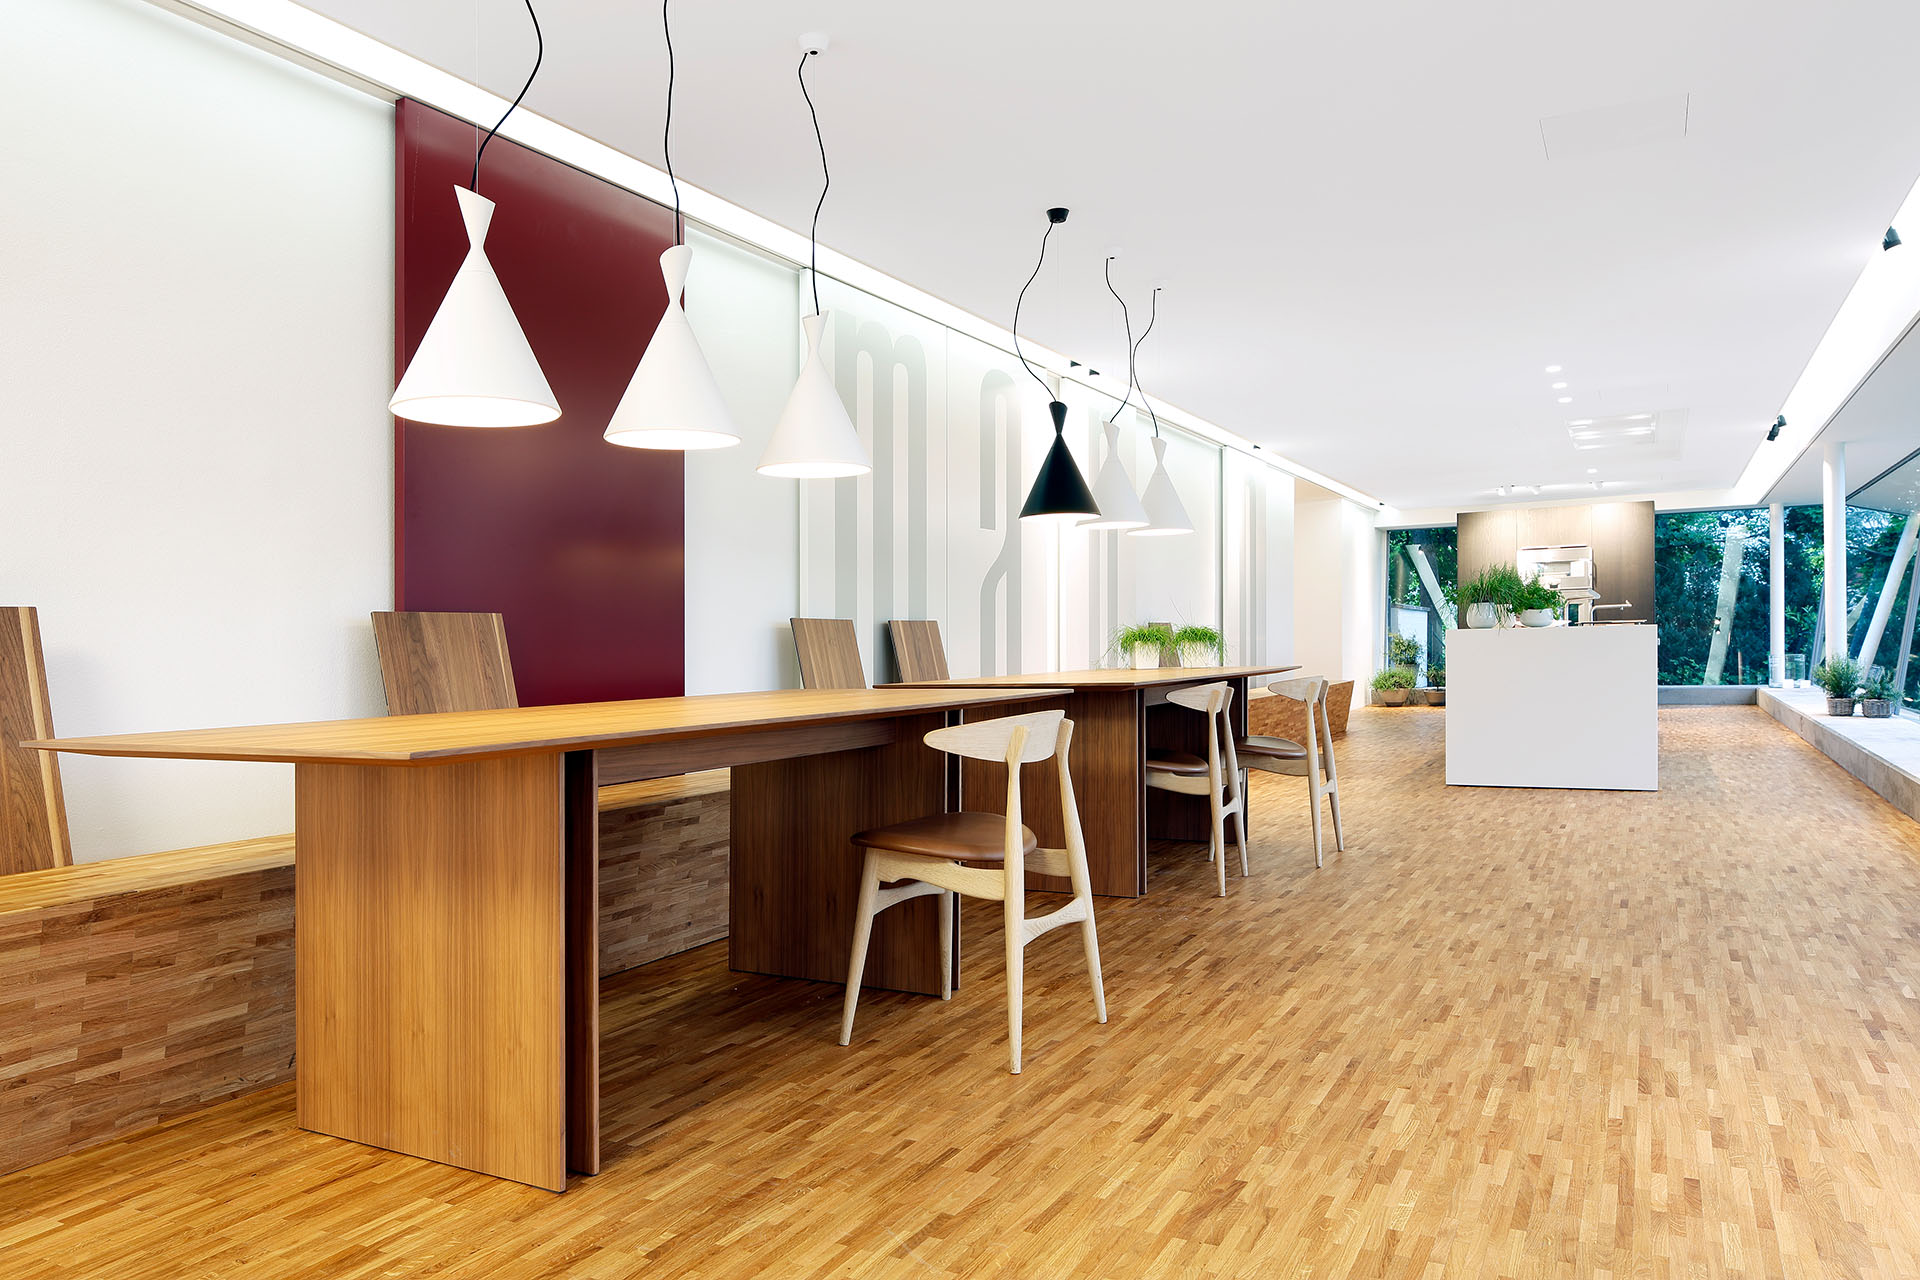 bulthaup Küchen Karlsruhe